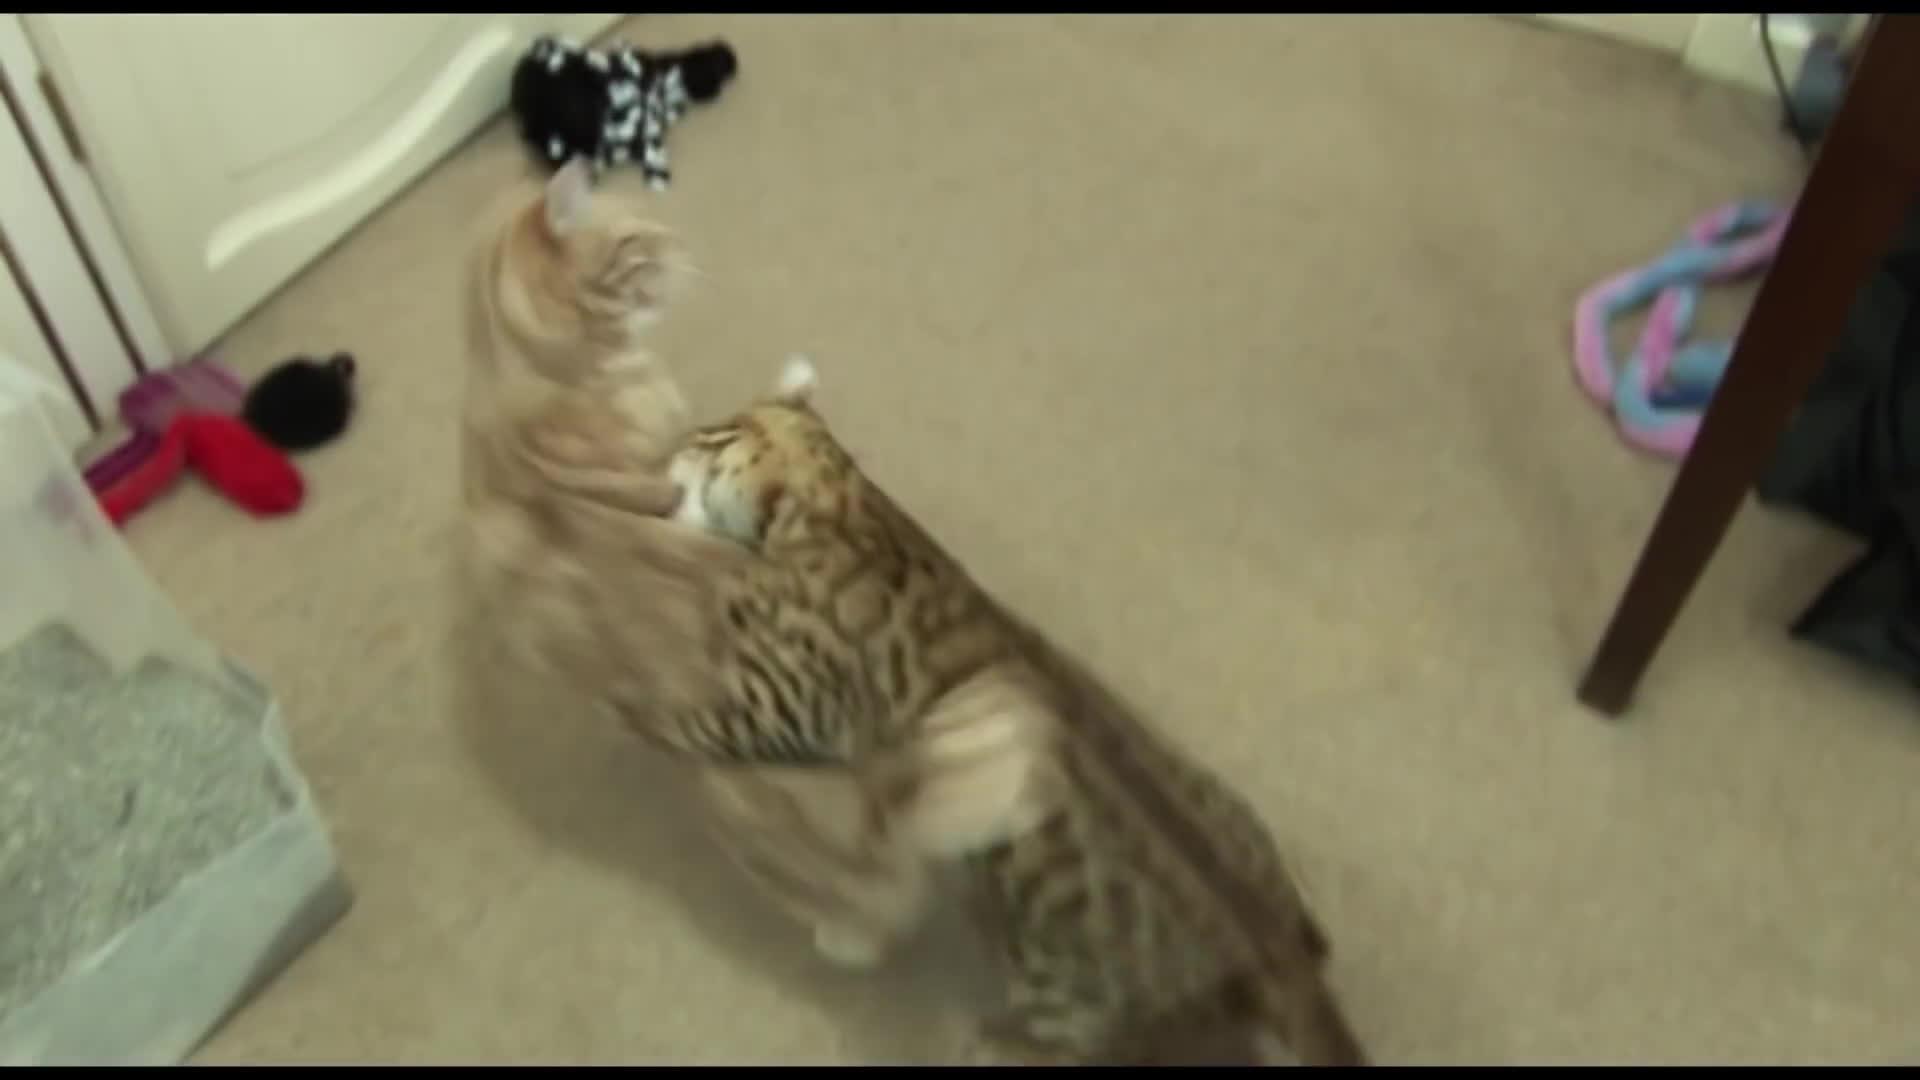 bengal (cat), catslaps, kitten (animal), Cat Fight! Bengal Kitten introduced to Adult Cat Part3 GIFs